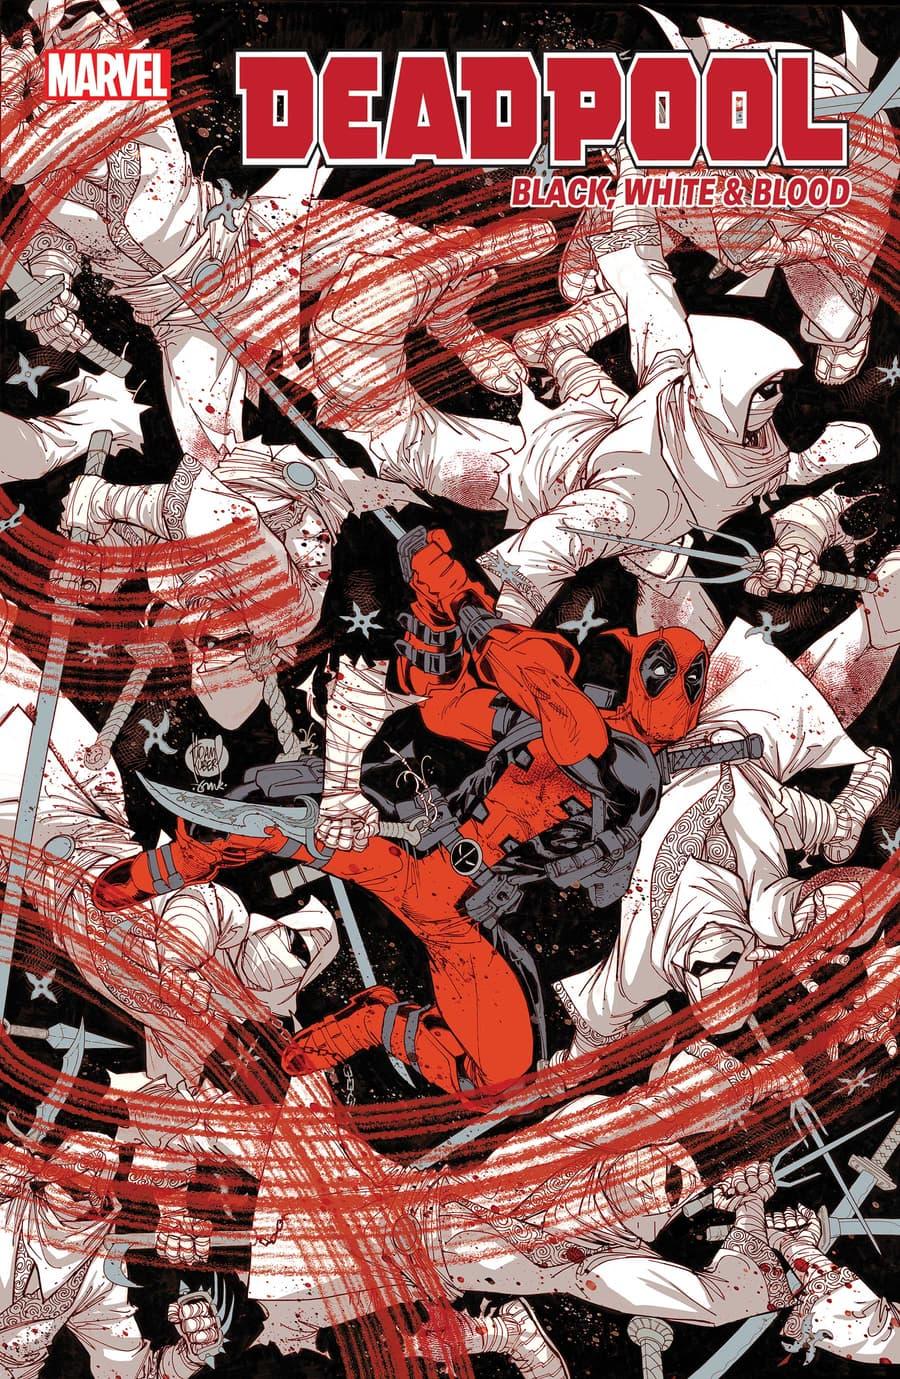 DEADPOOL: BLACK, WHITE & BLOOD#1 cover by Adam Kubert